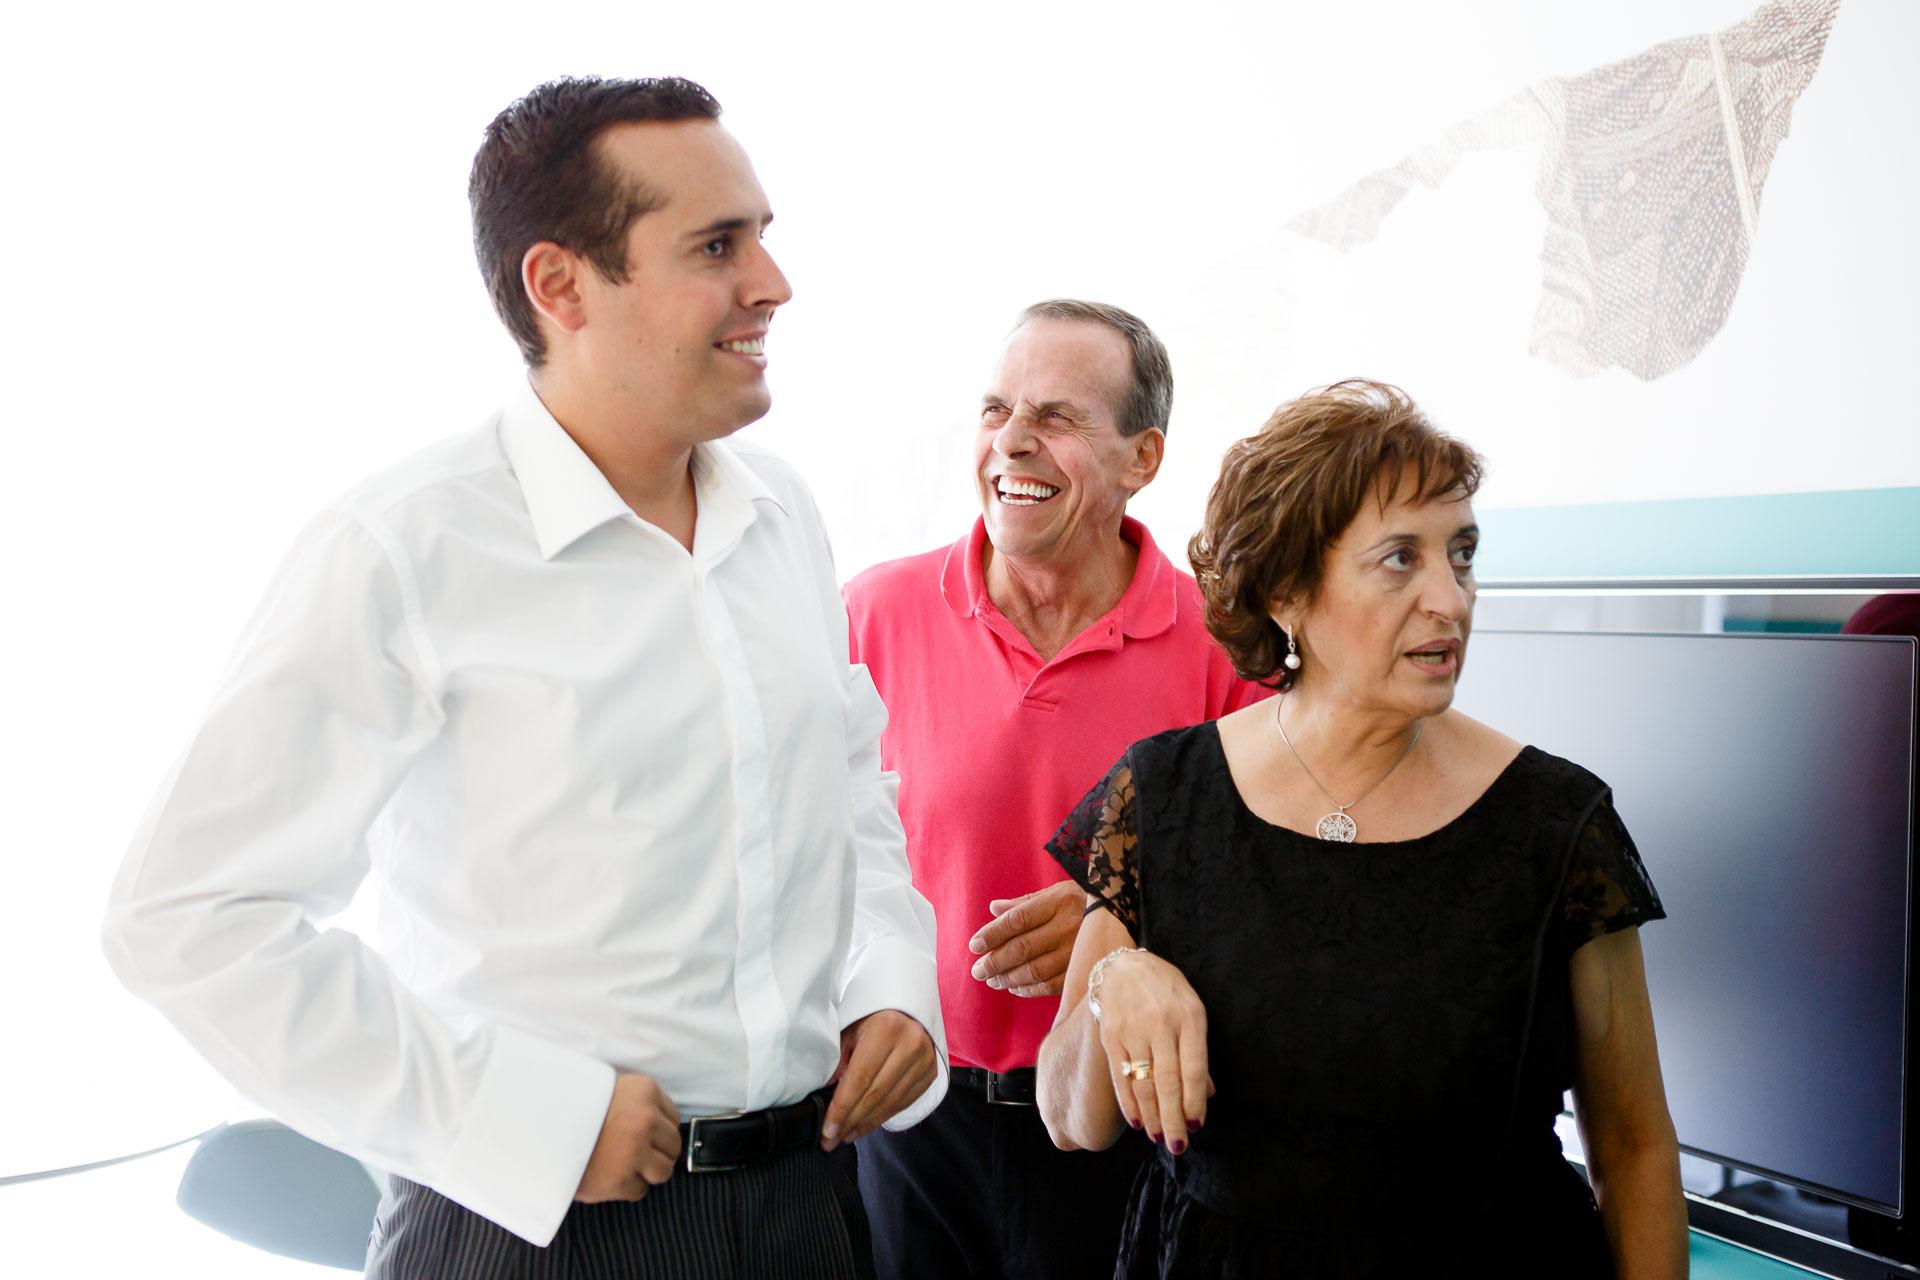 www.aitoraudicana.com